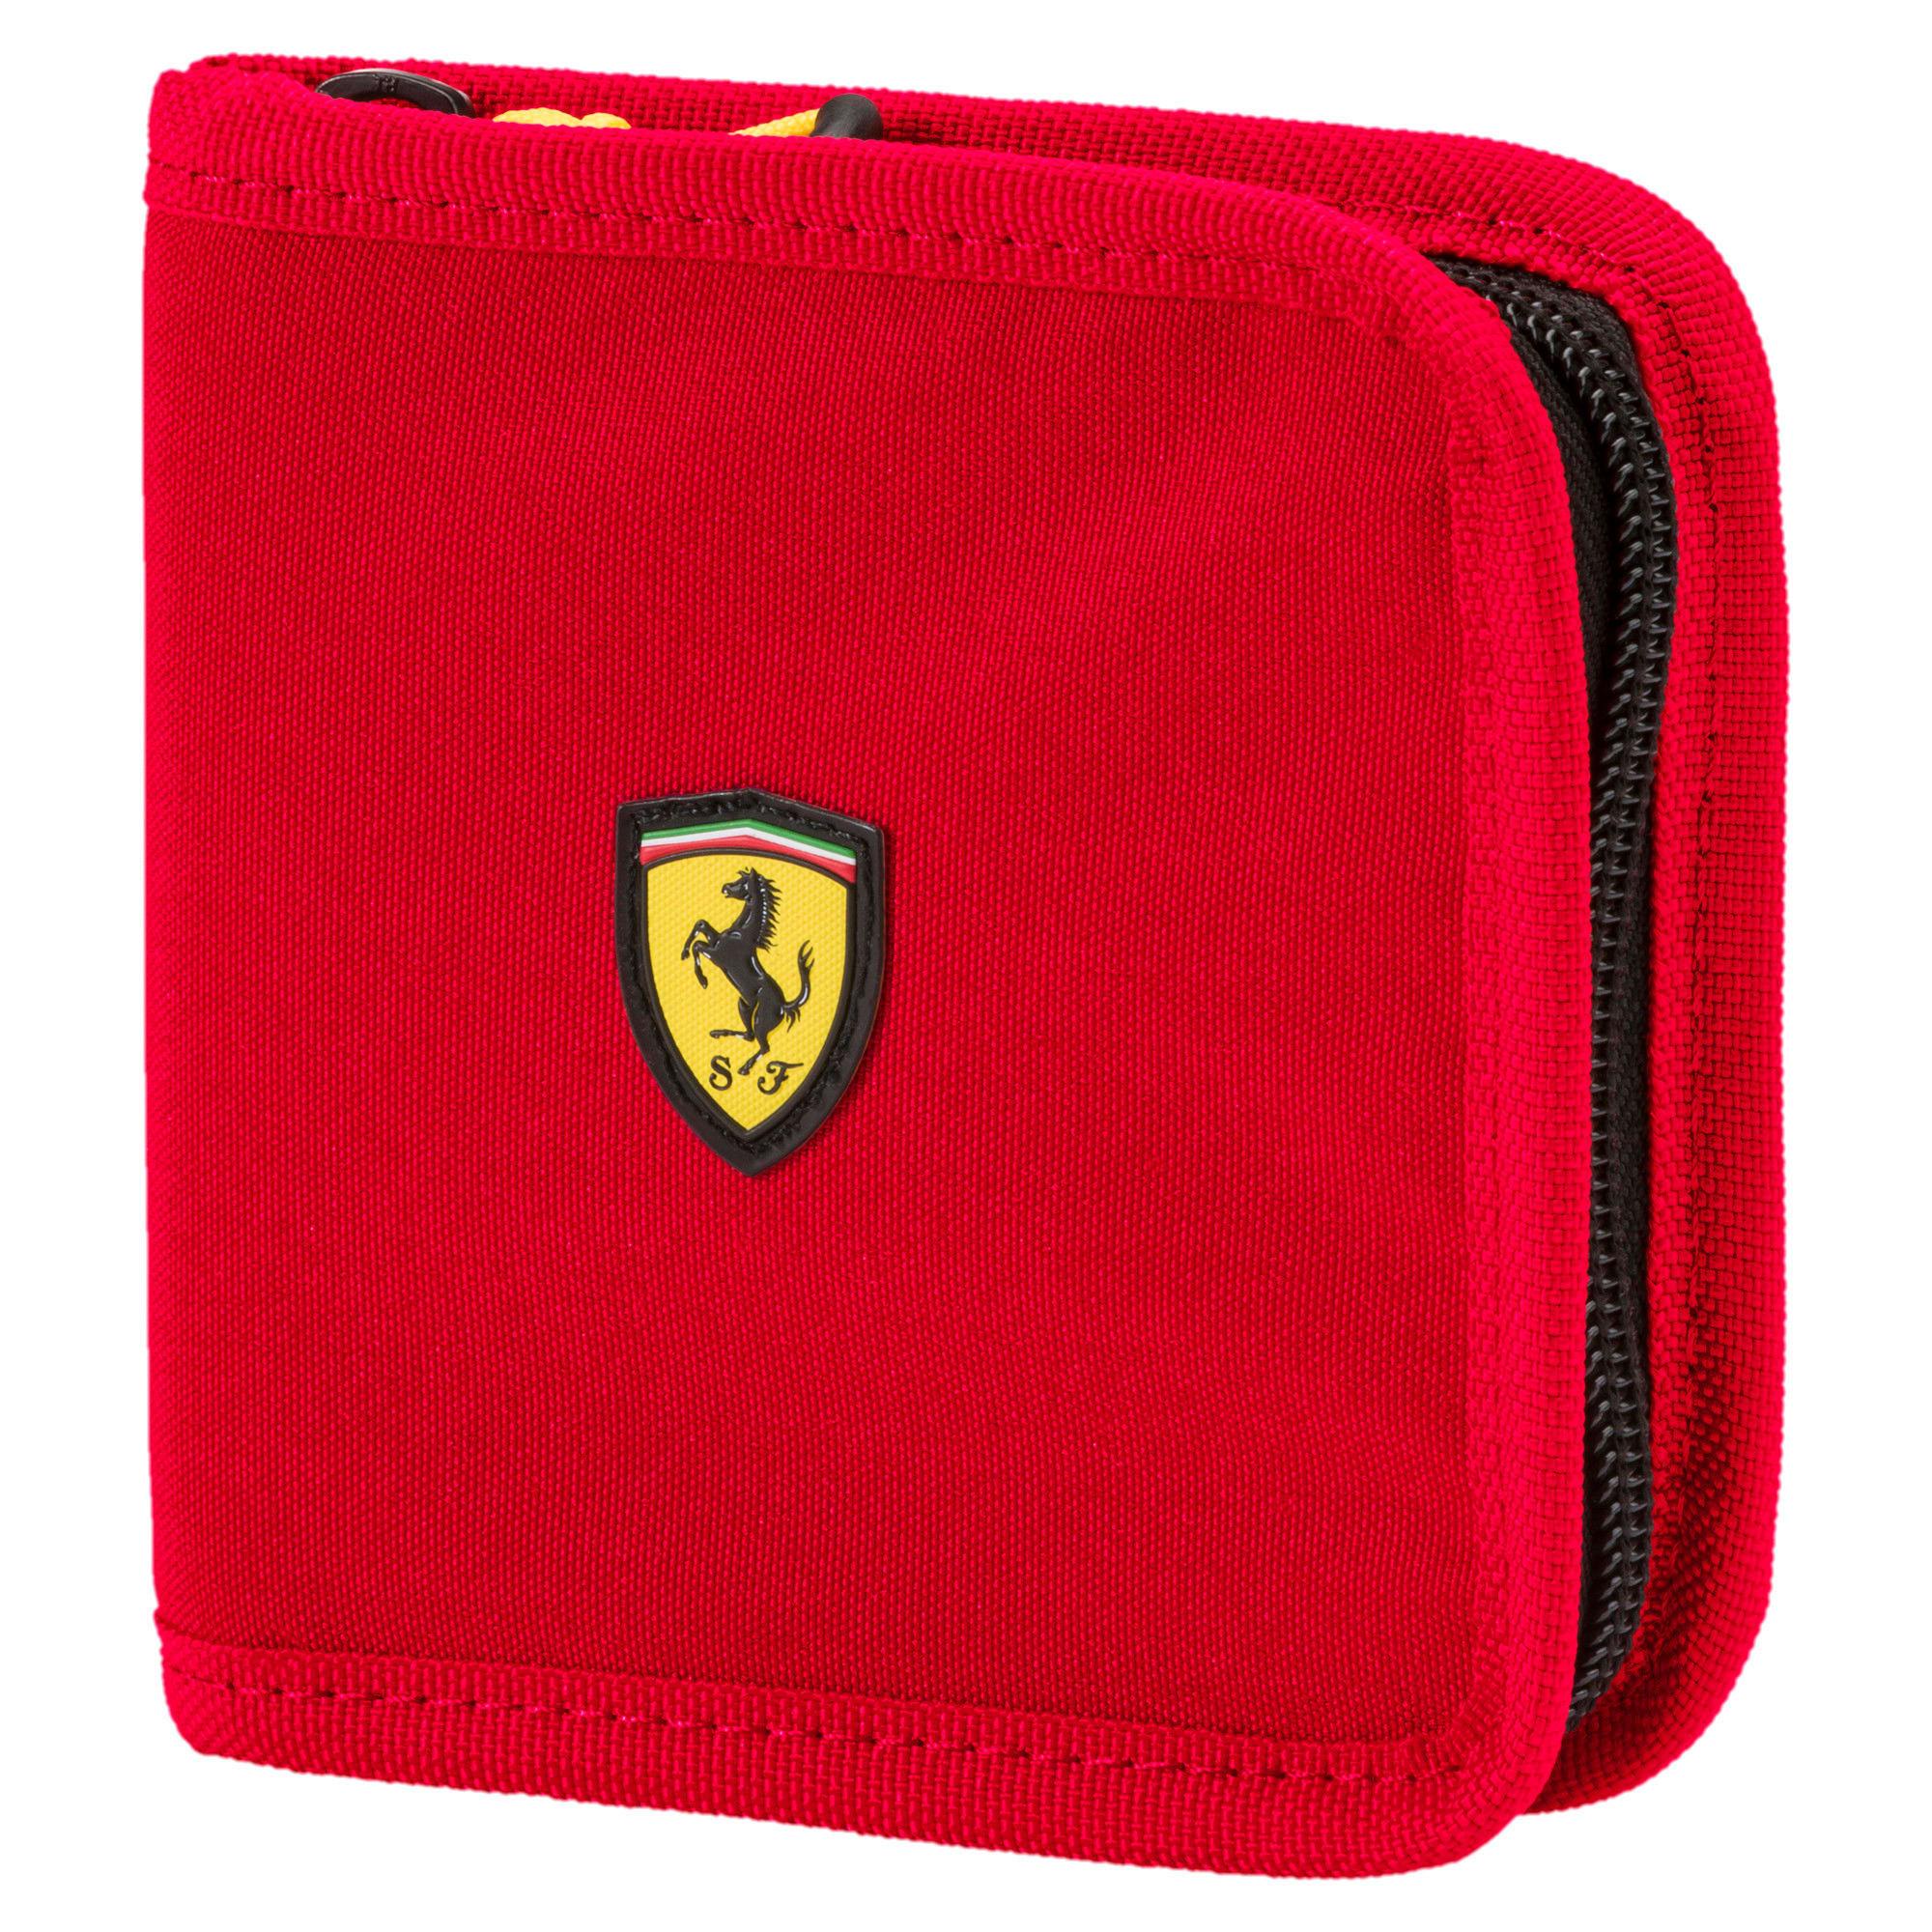 Thumbnail 1 of Ferrari Fanwear Wallet, Rosso Corsa, medium-IND